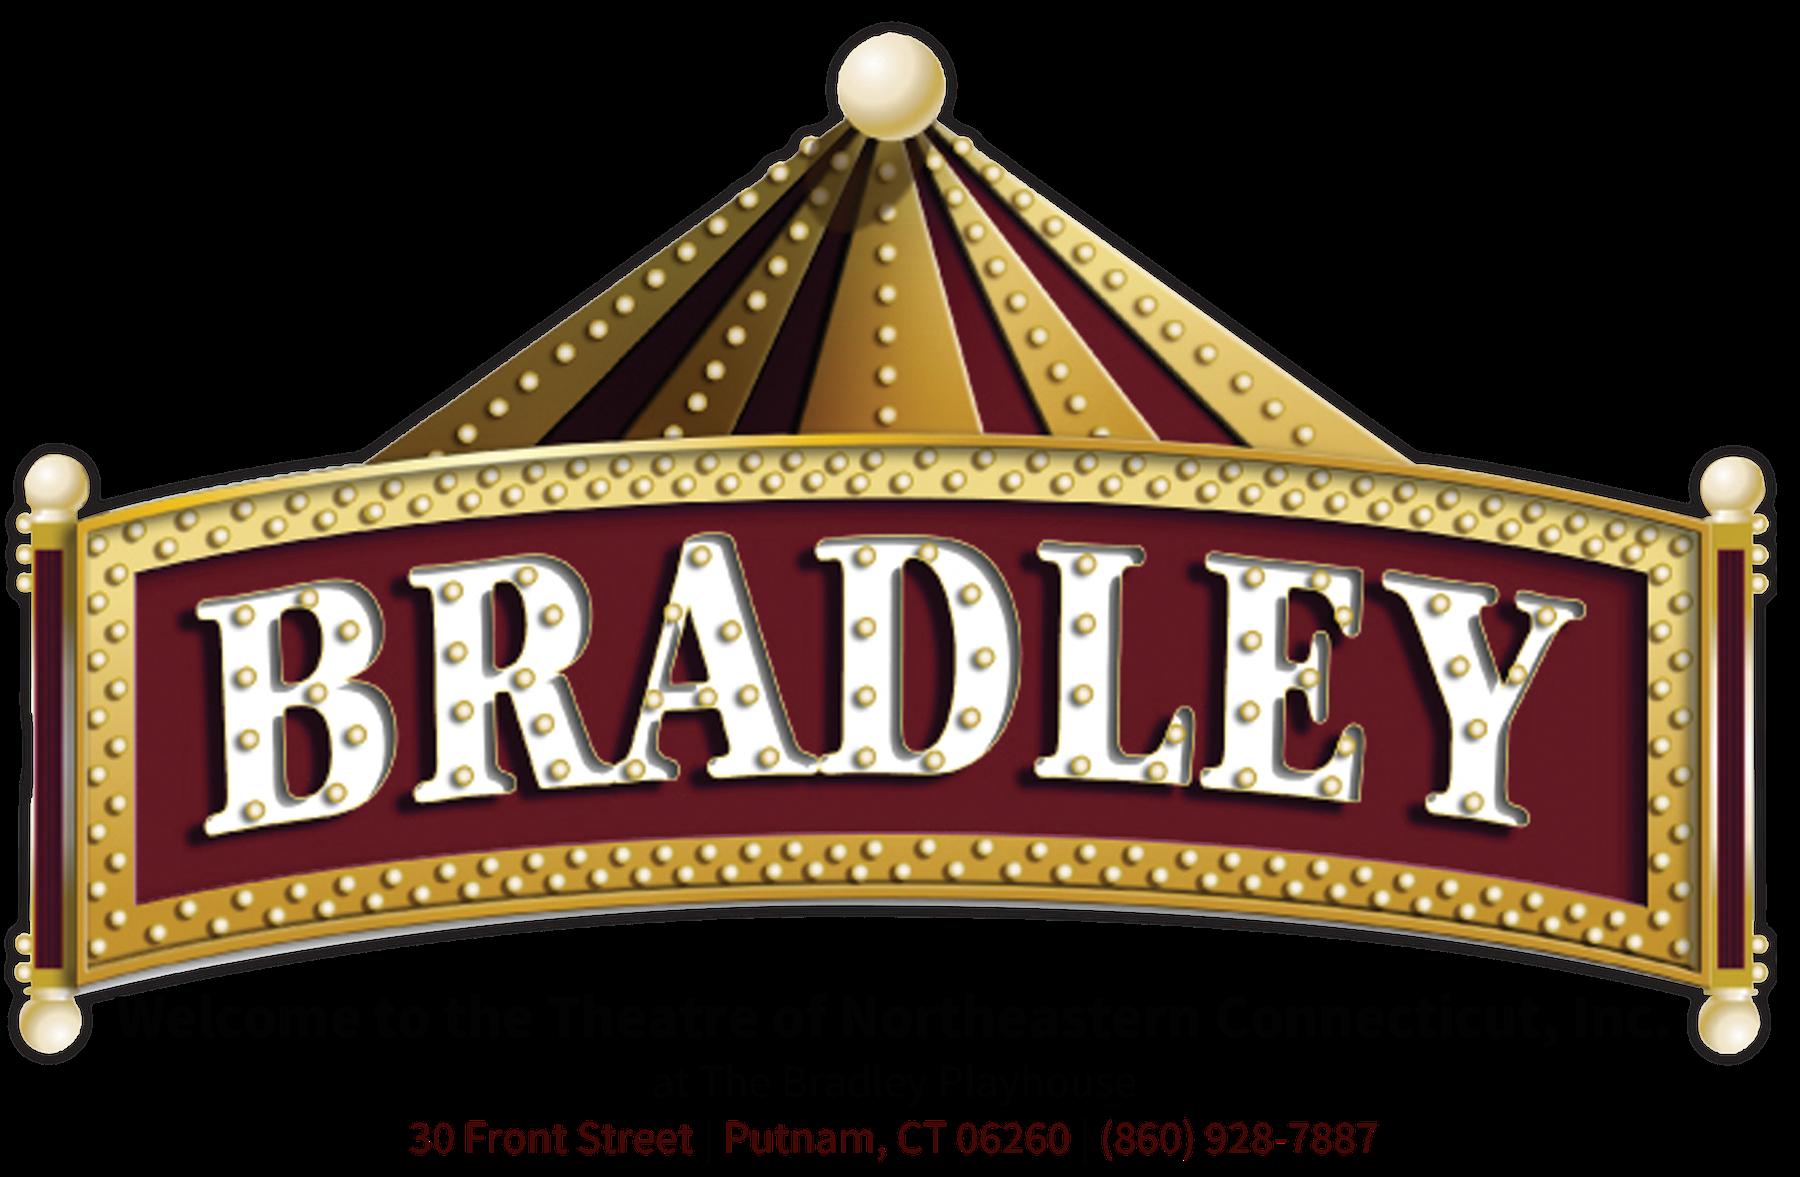 Bradley Playhouse – TNECT (Theater of Northeastern CT)